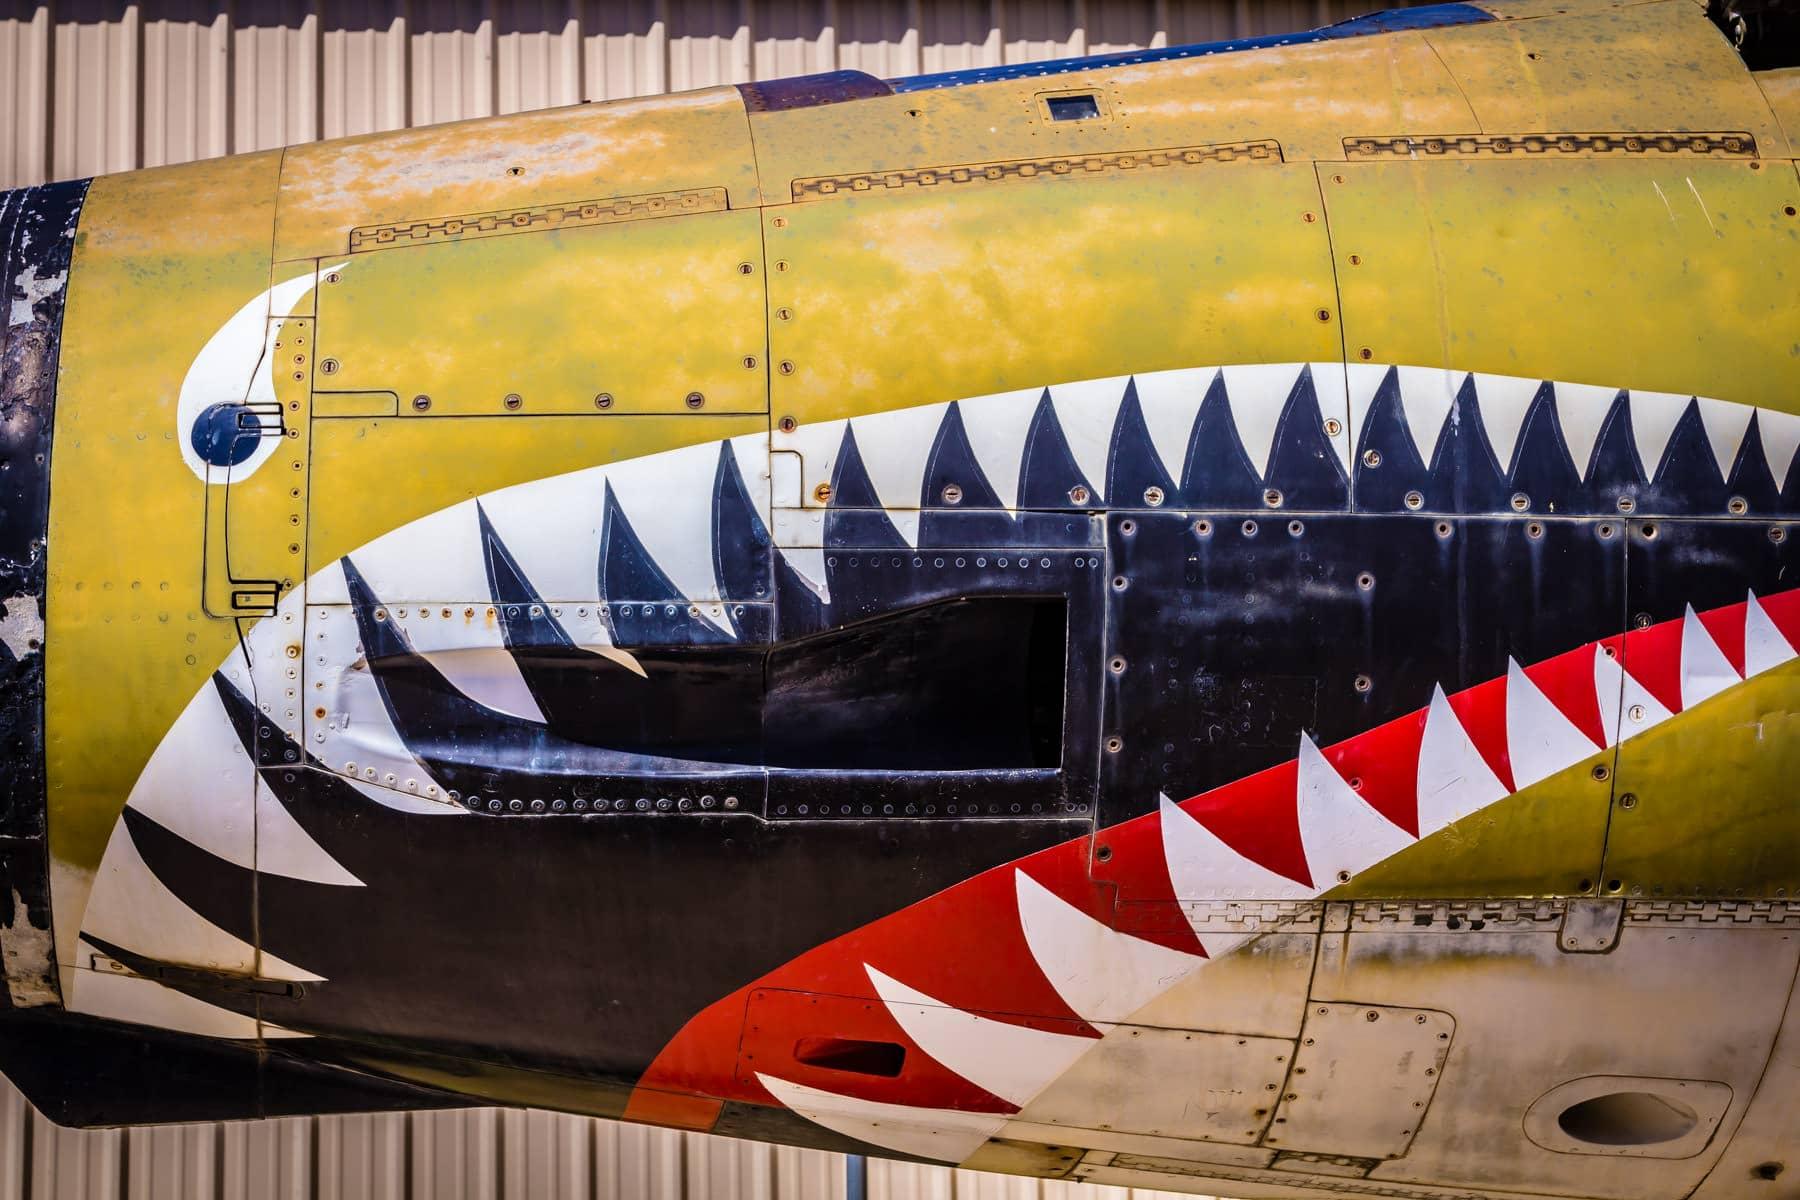 Nose art on a Republic F-105F Thunderchief at the Cavanaugh Flight Museum, Addison, Texas.